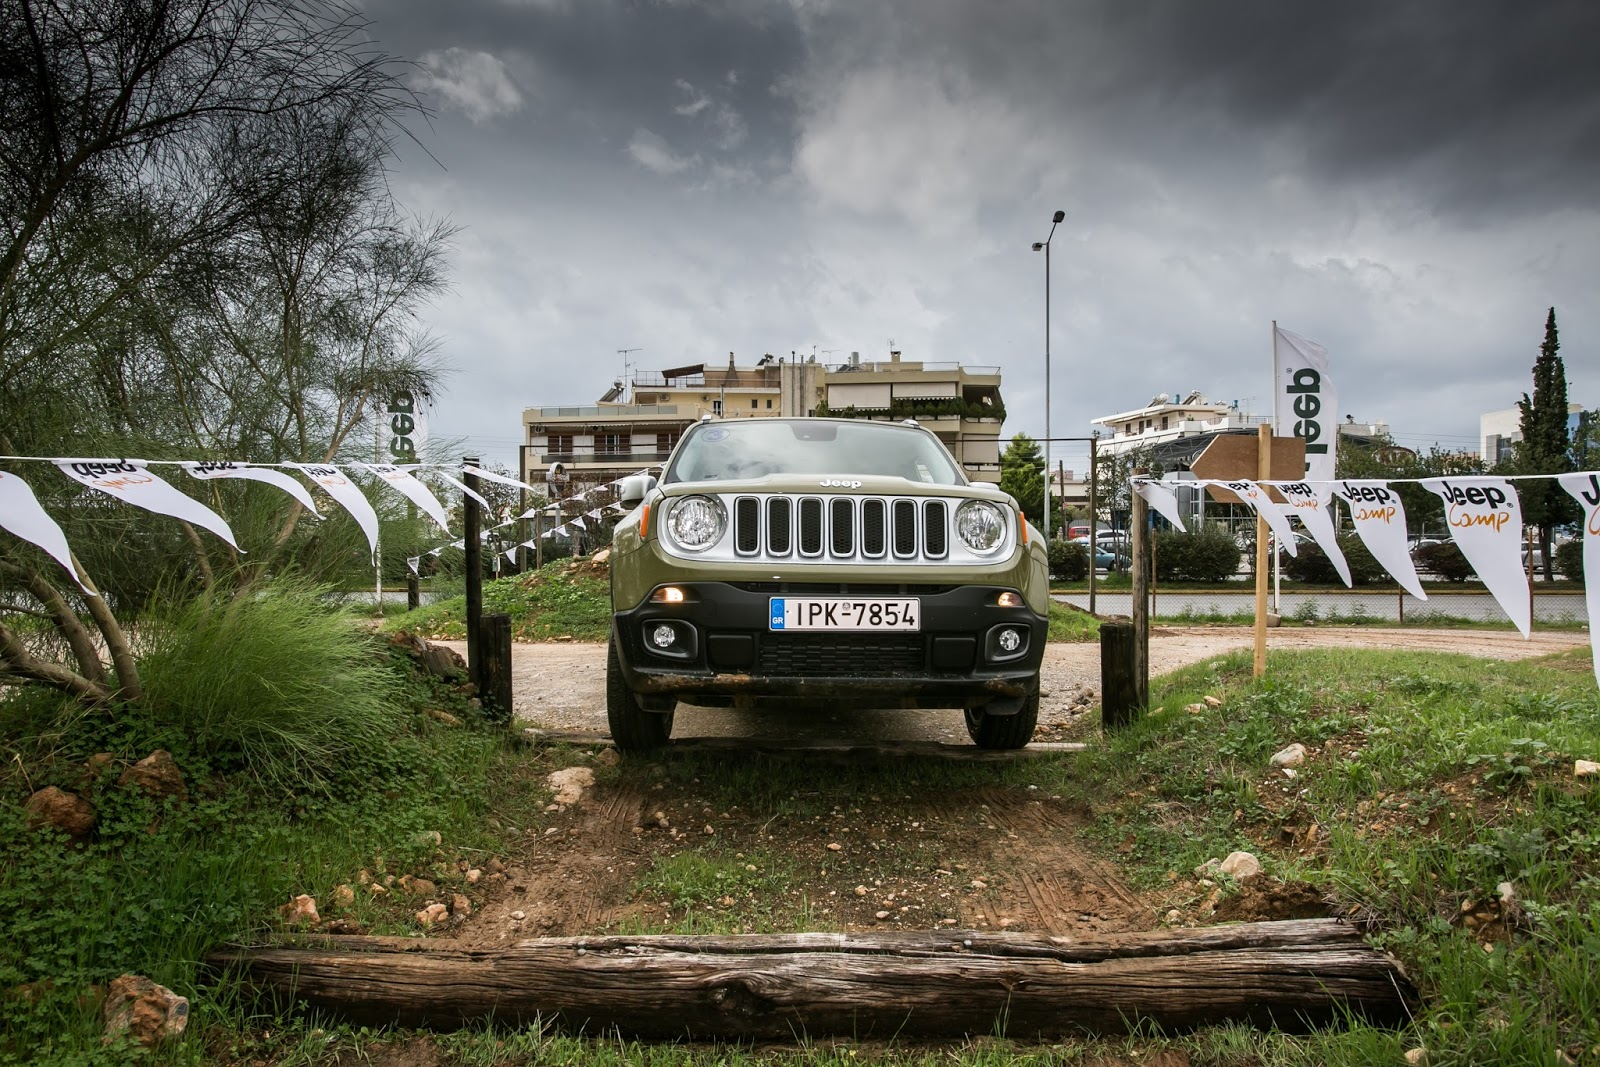 GK 0430 Πετάμε ένα Jeep Renegade σε λάσπες, πέτρες, άμμο, λίμνες. Θα τα καταφέρει; Jeep, Jeep Renegade, Renegade, SUV, TEST, zblog, ΔΟΚΙΜΕΣ